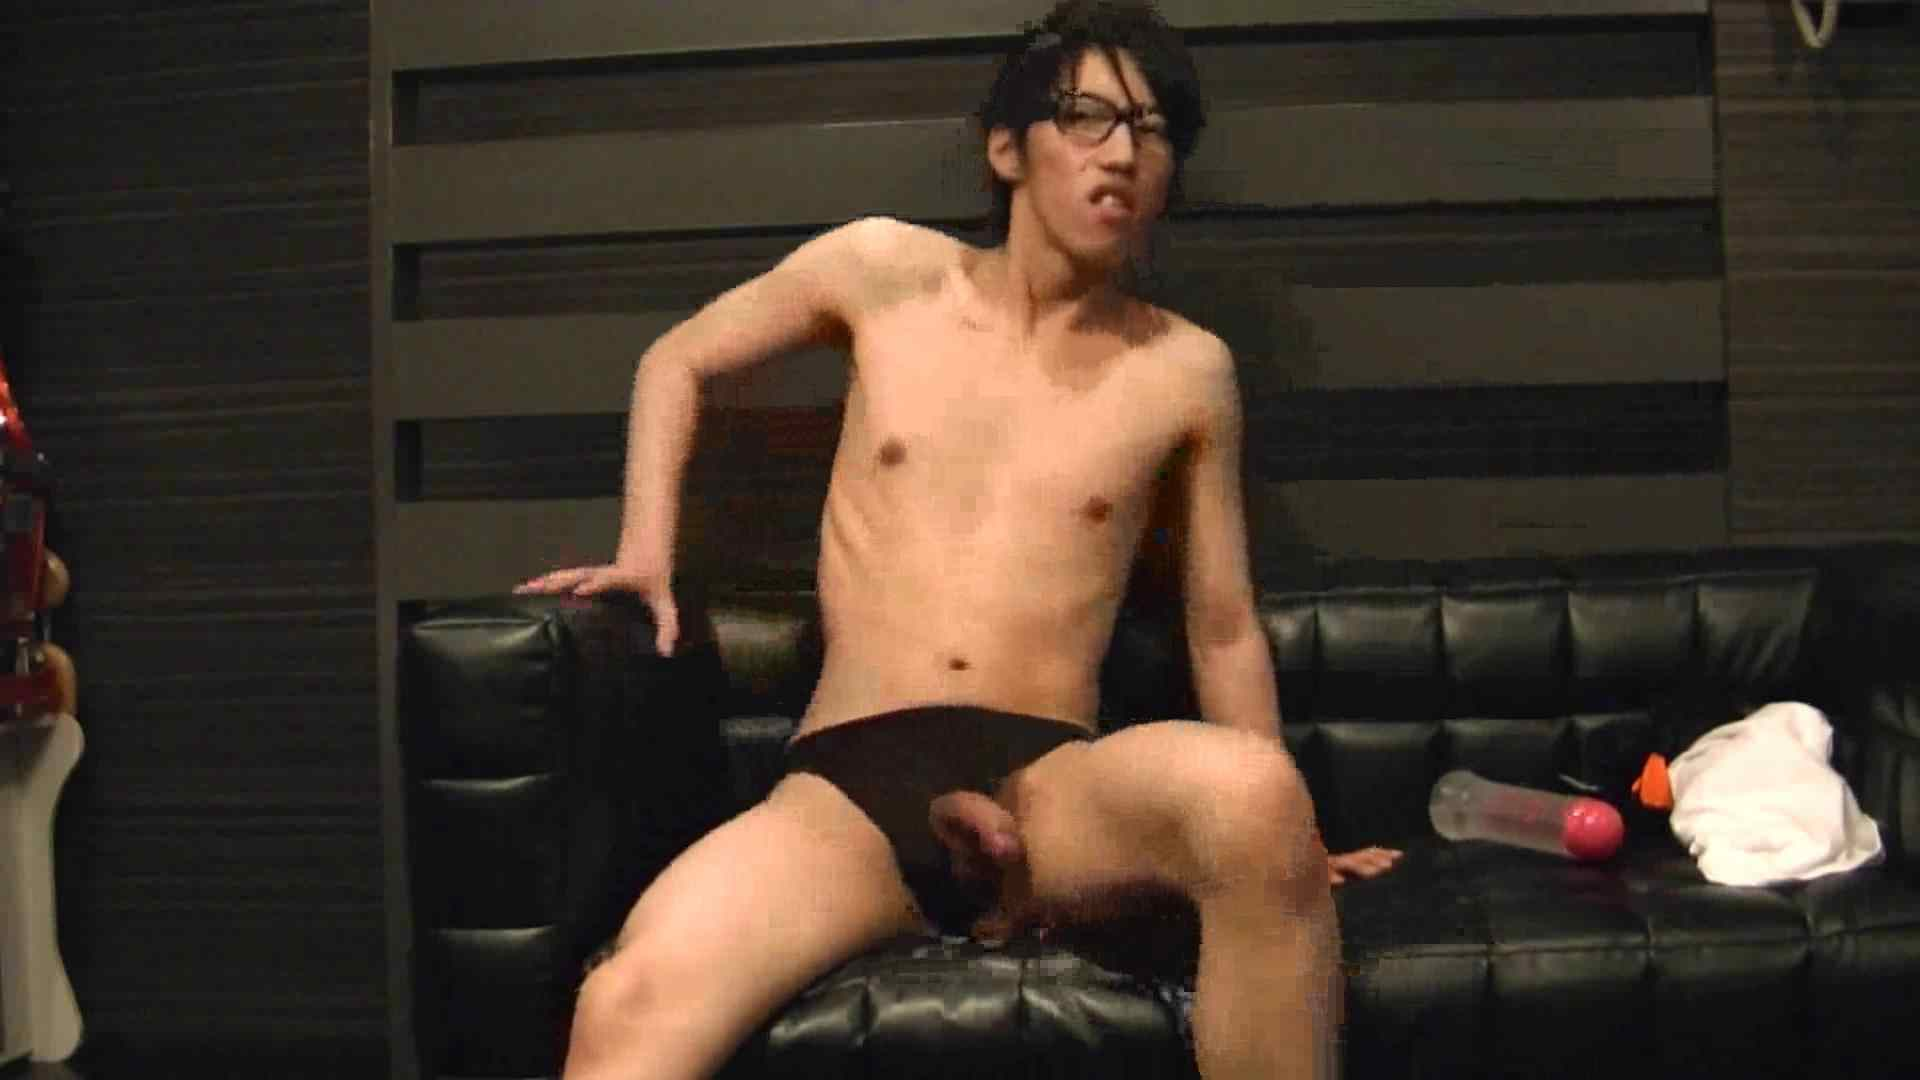 ONA見せカーニバル!! Vol3 男  93pic 21